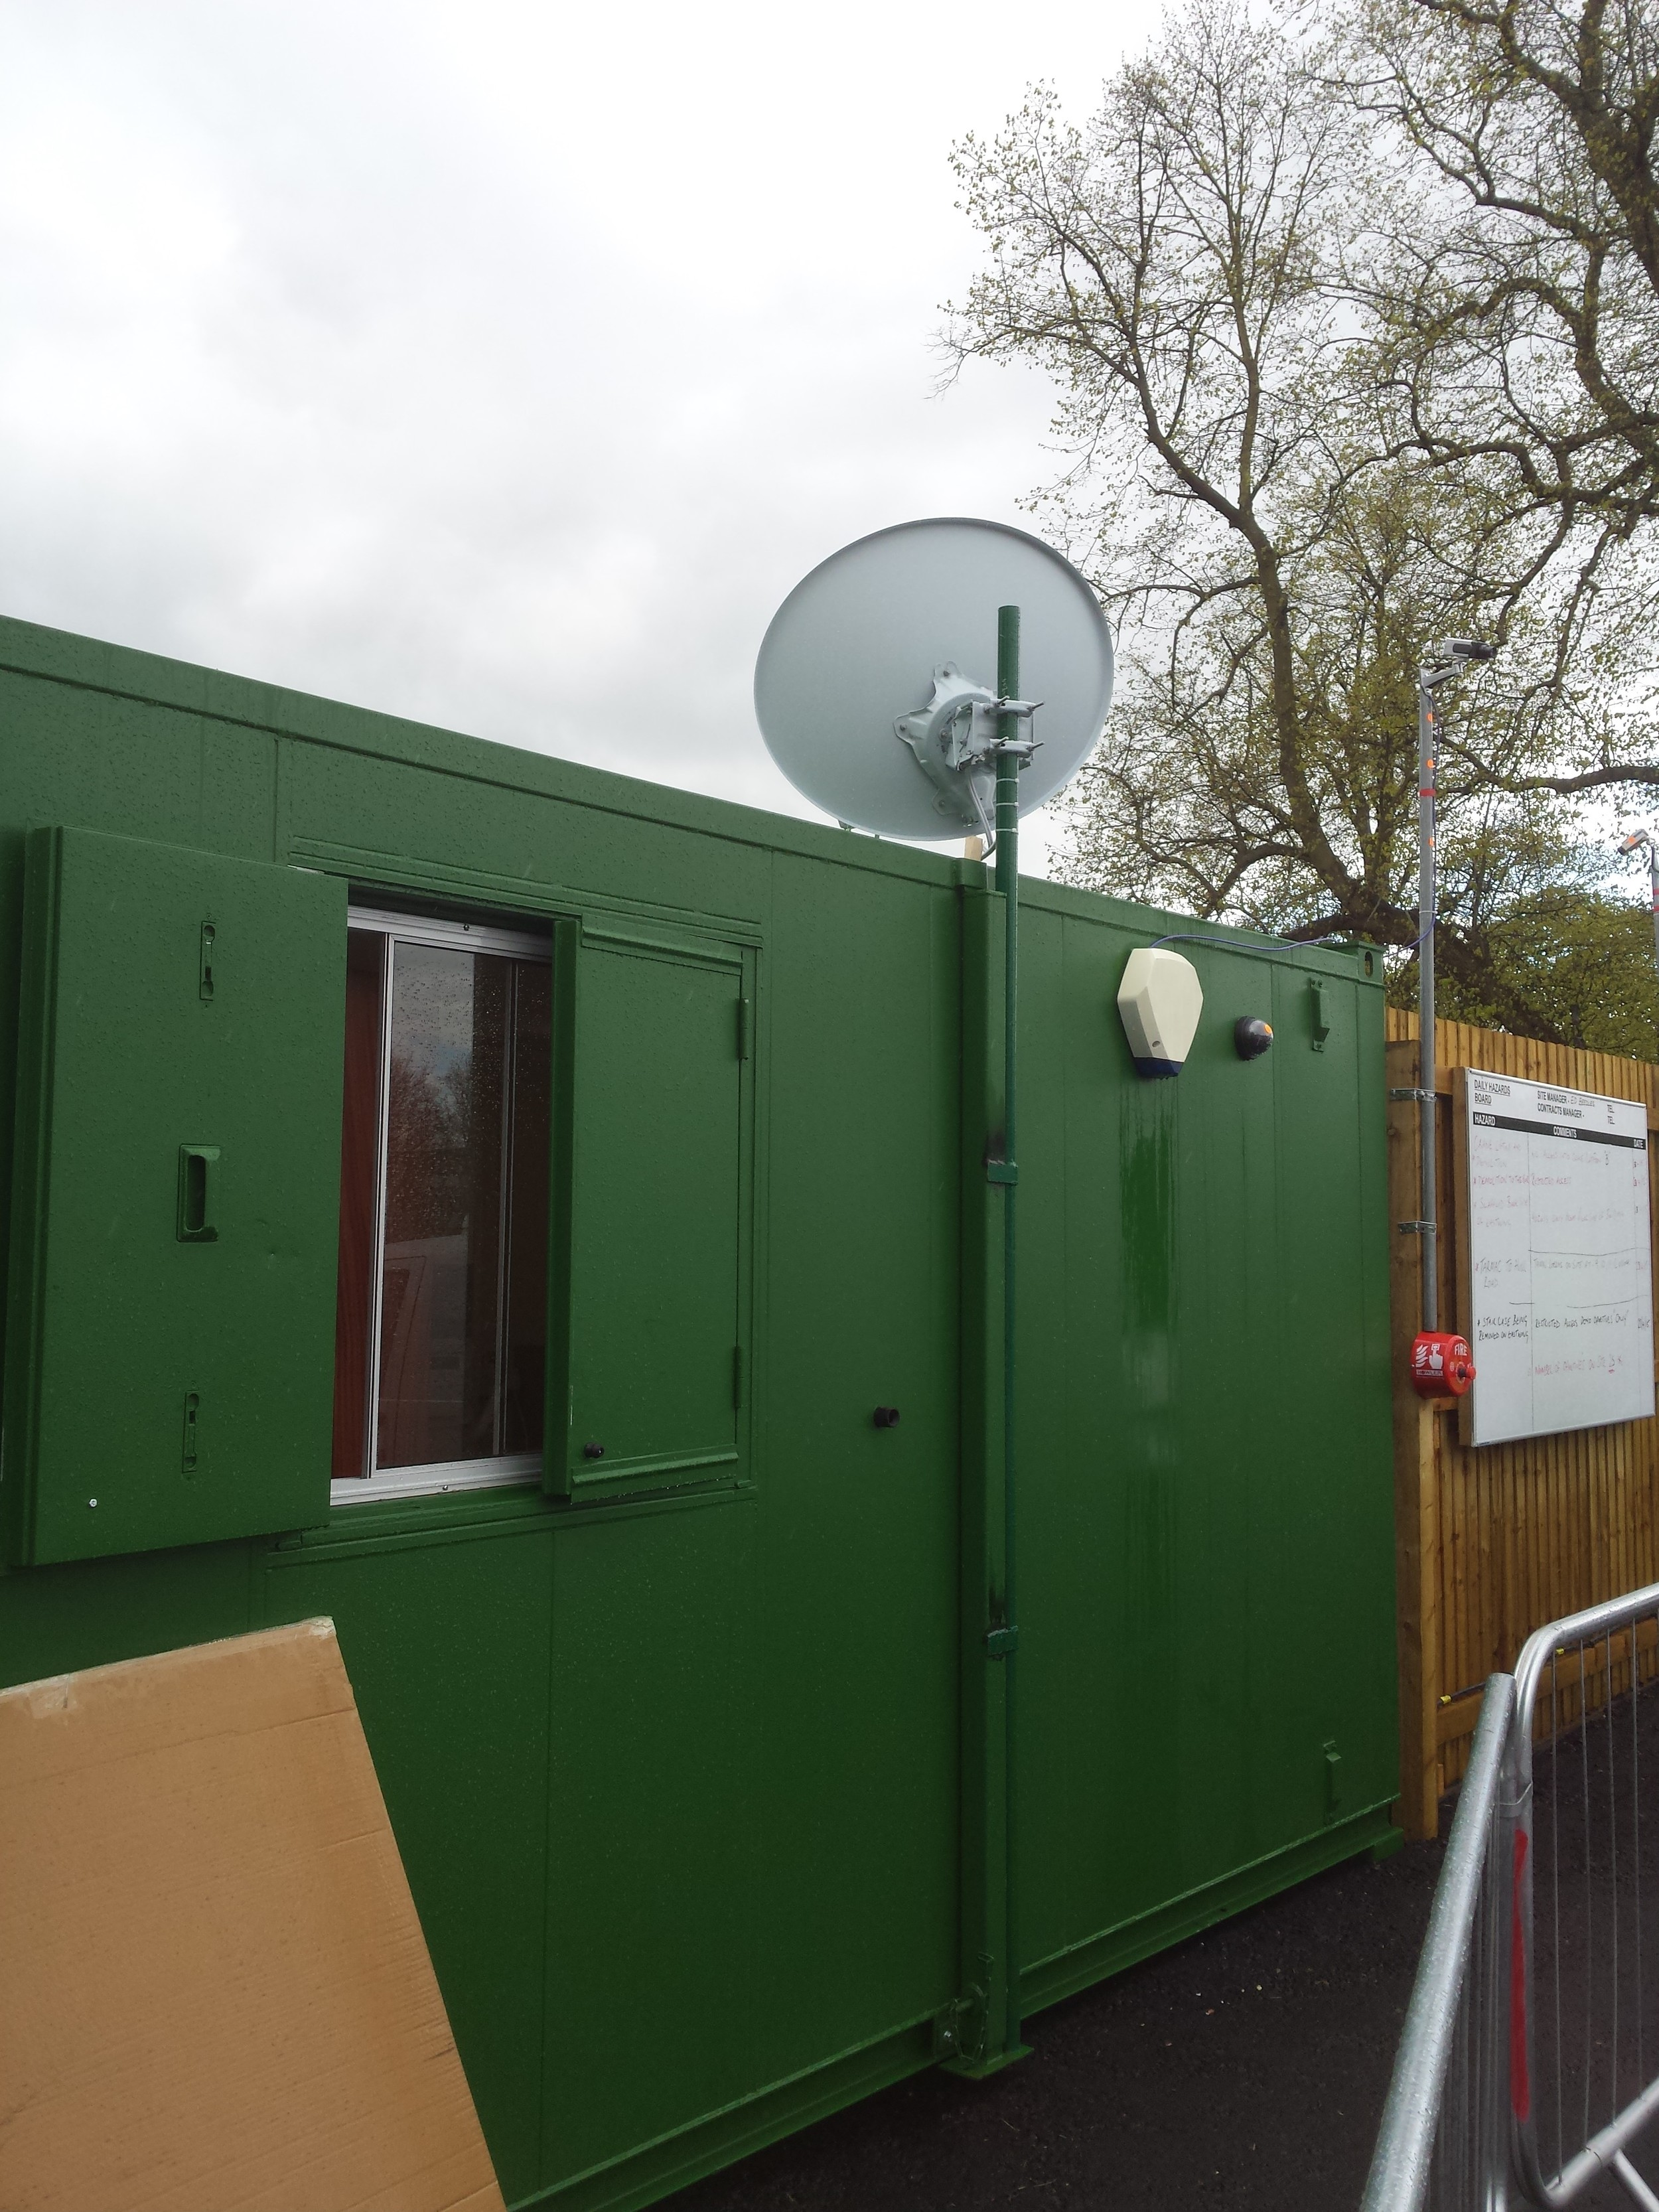 Satellite Broadband Installation at Former Stafford Hospital for Shropshire Homes Limited